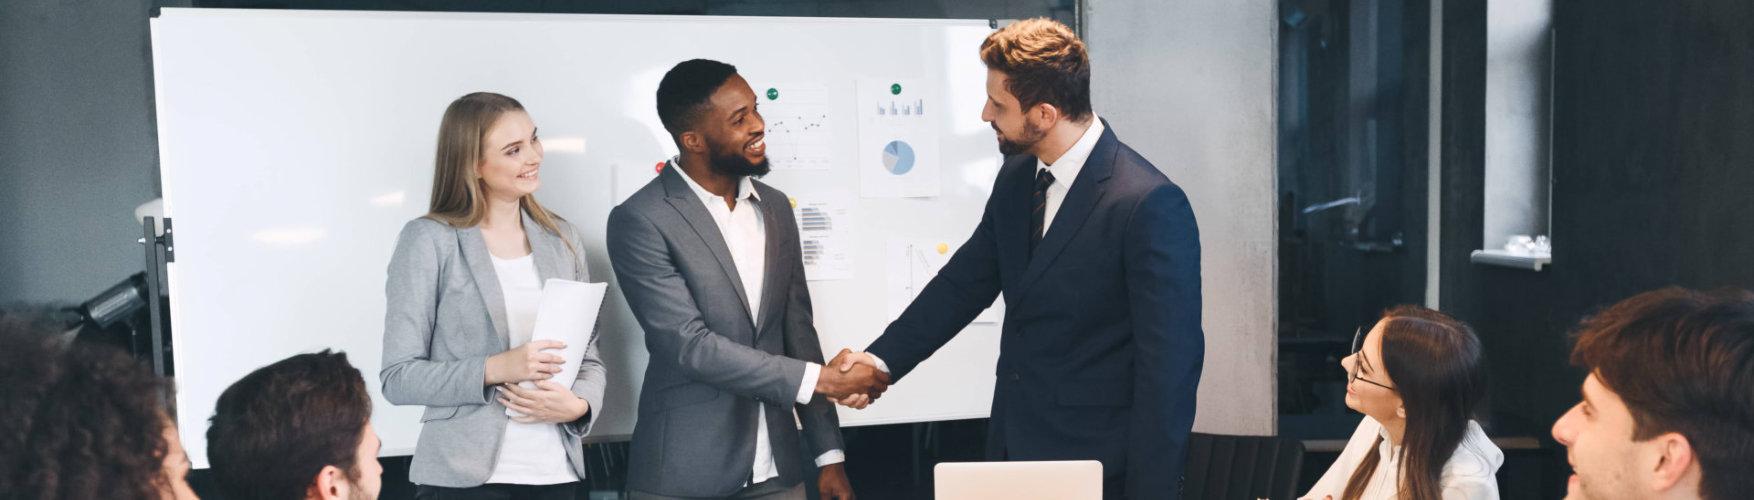 business partners doing shakehands